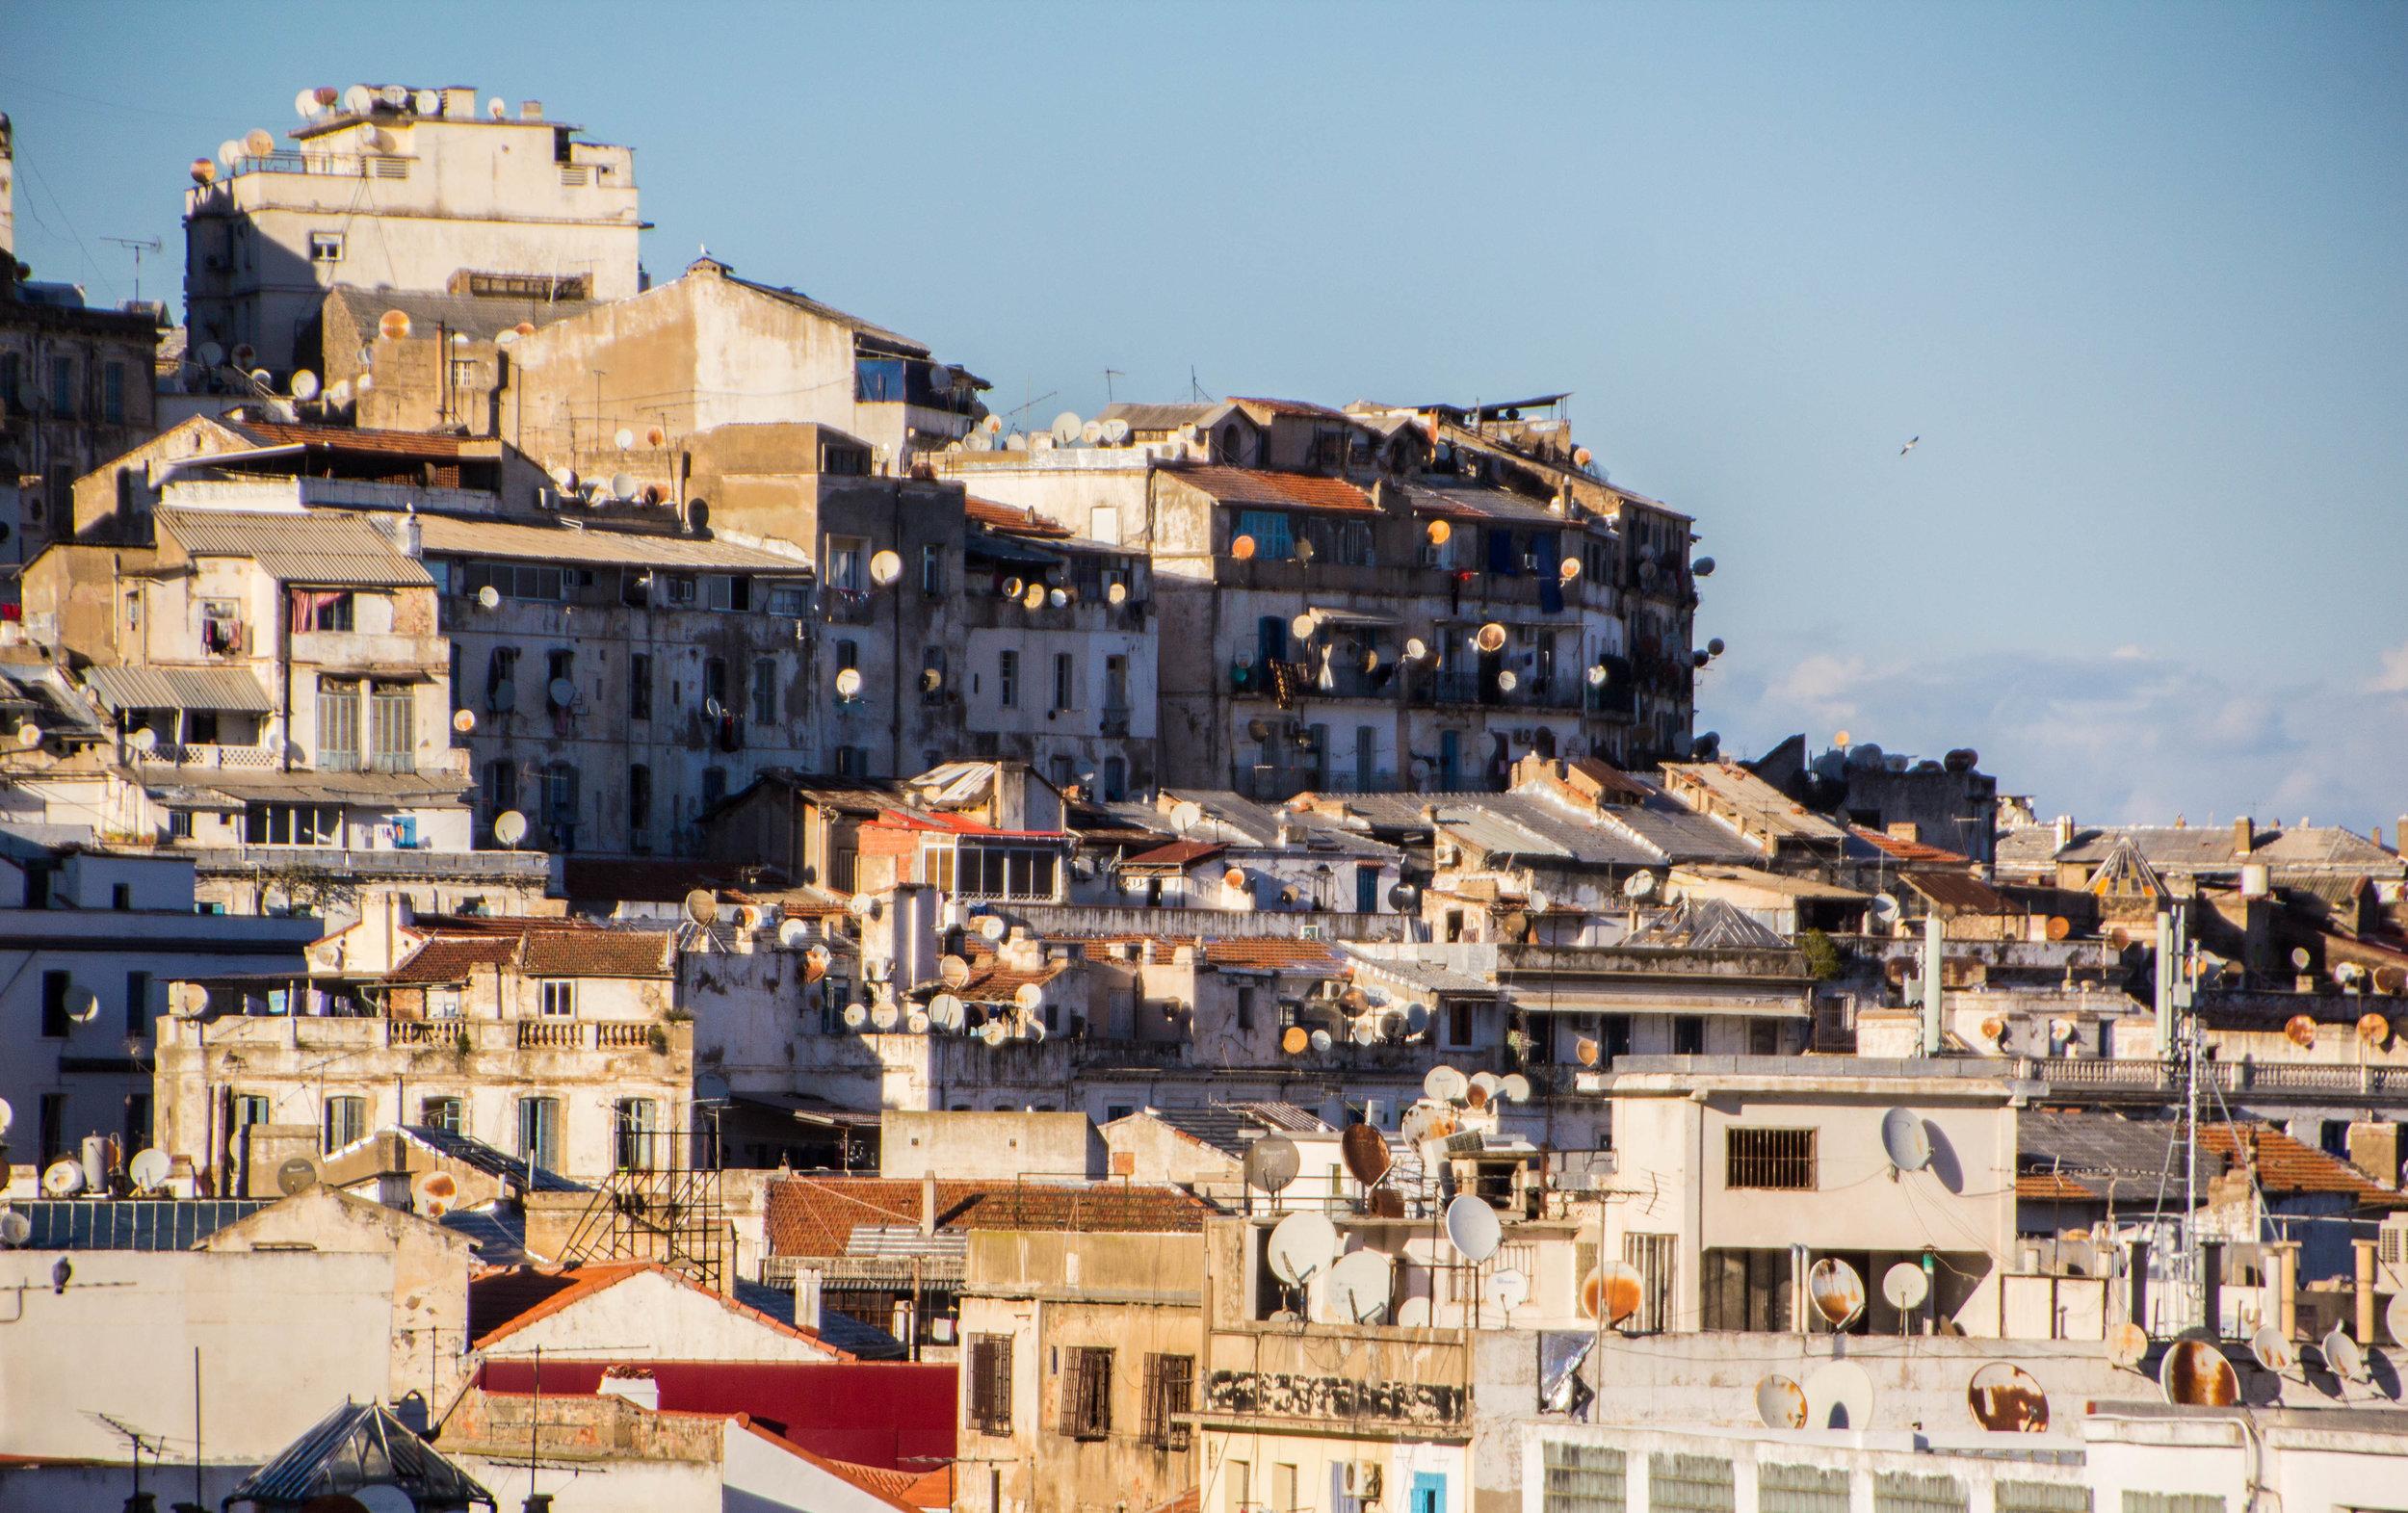 streets-algiers-algeria-14-2.jpg